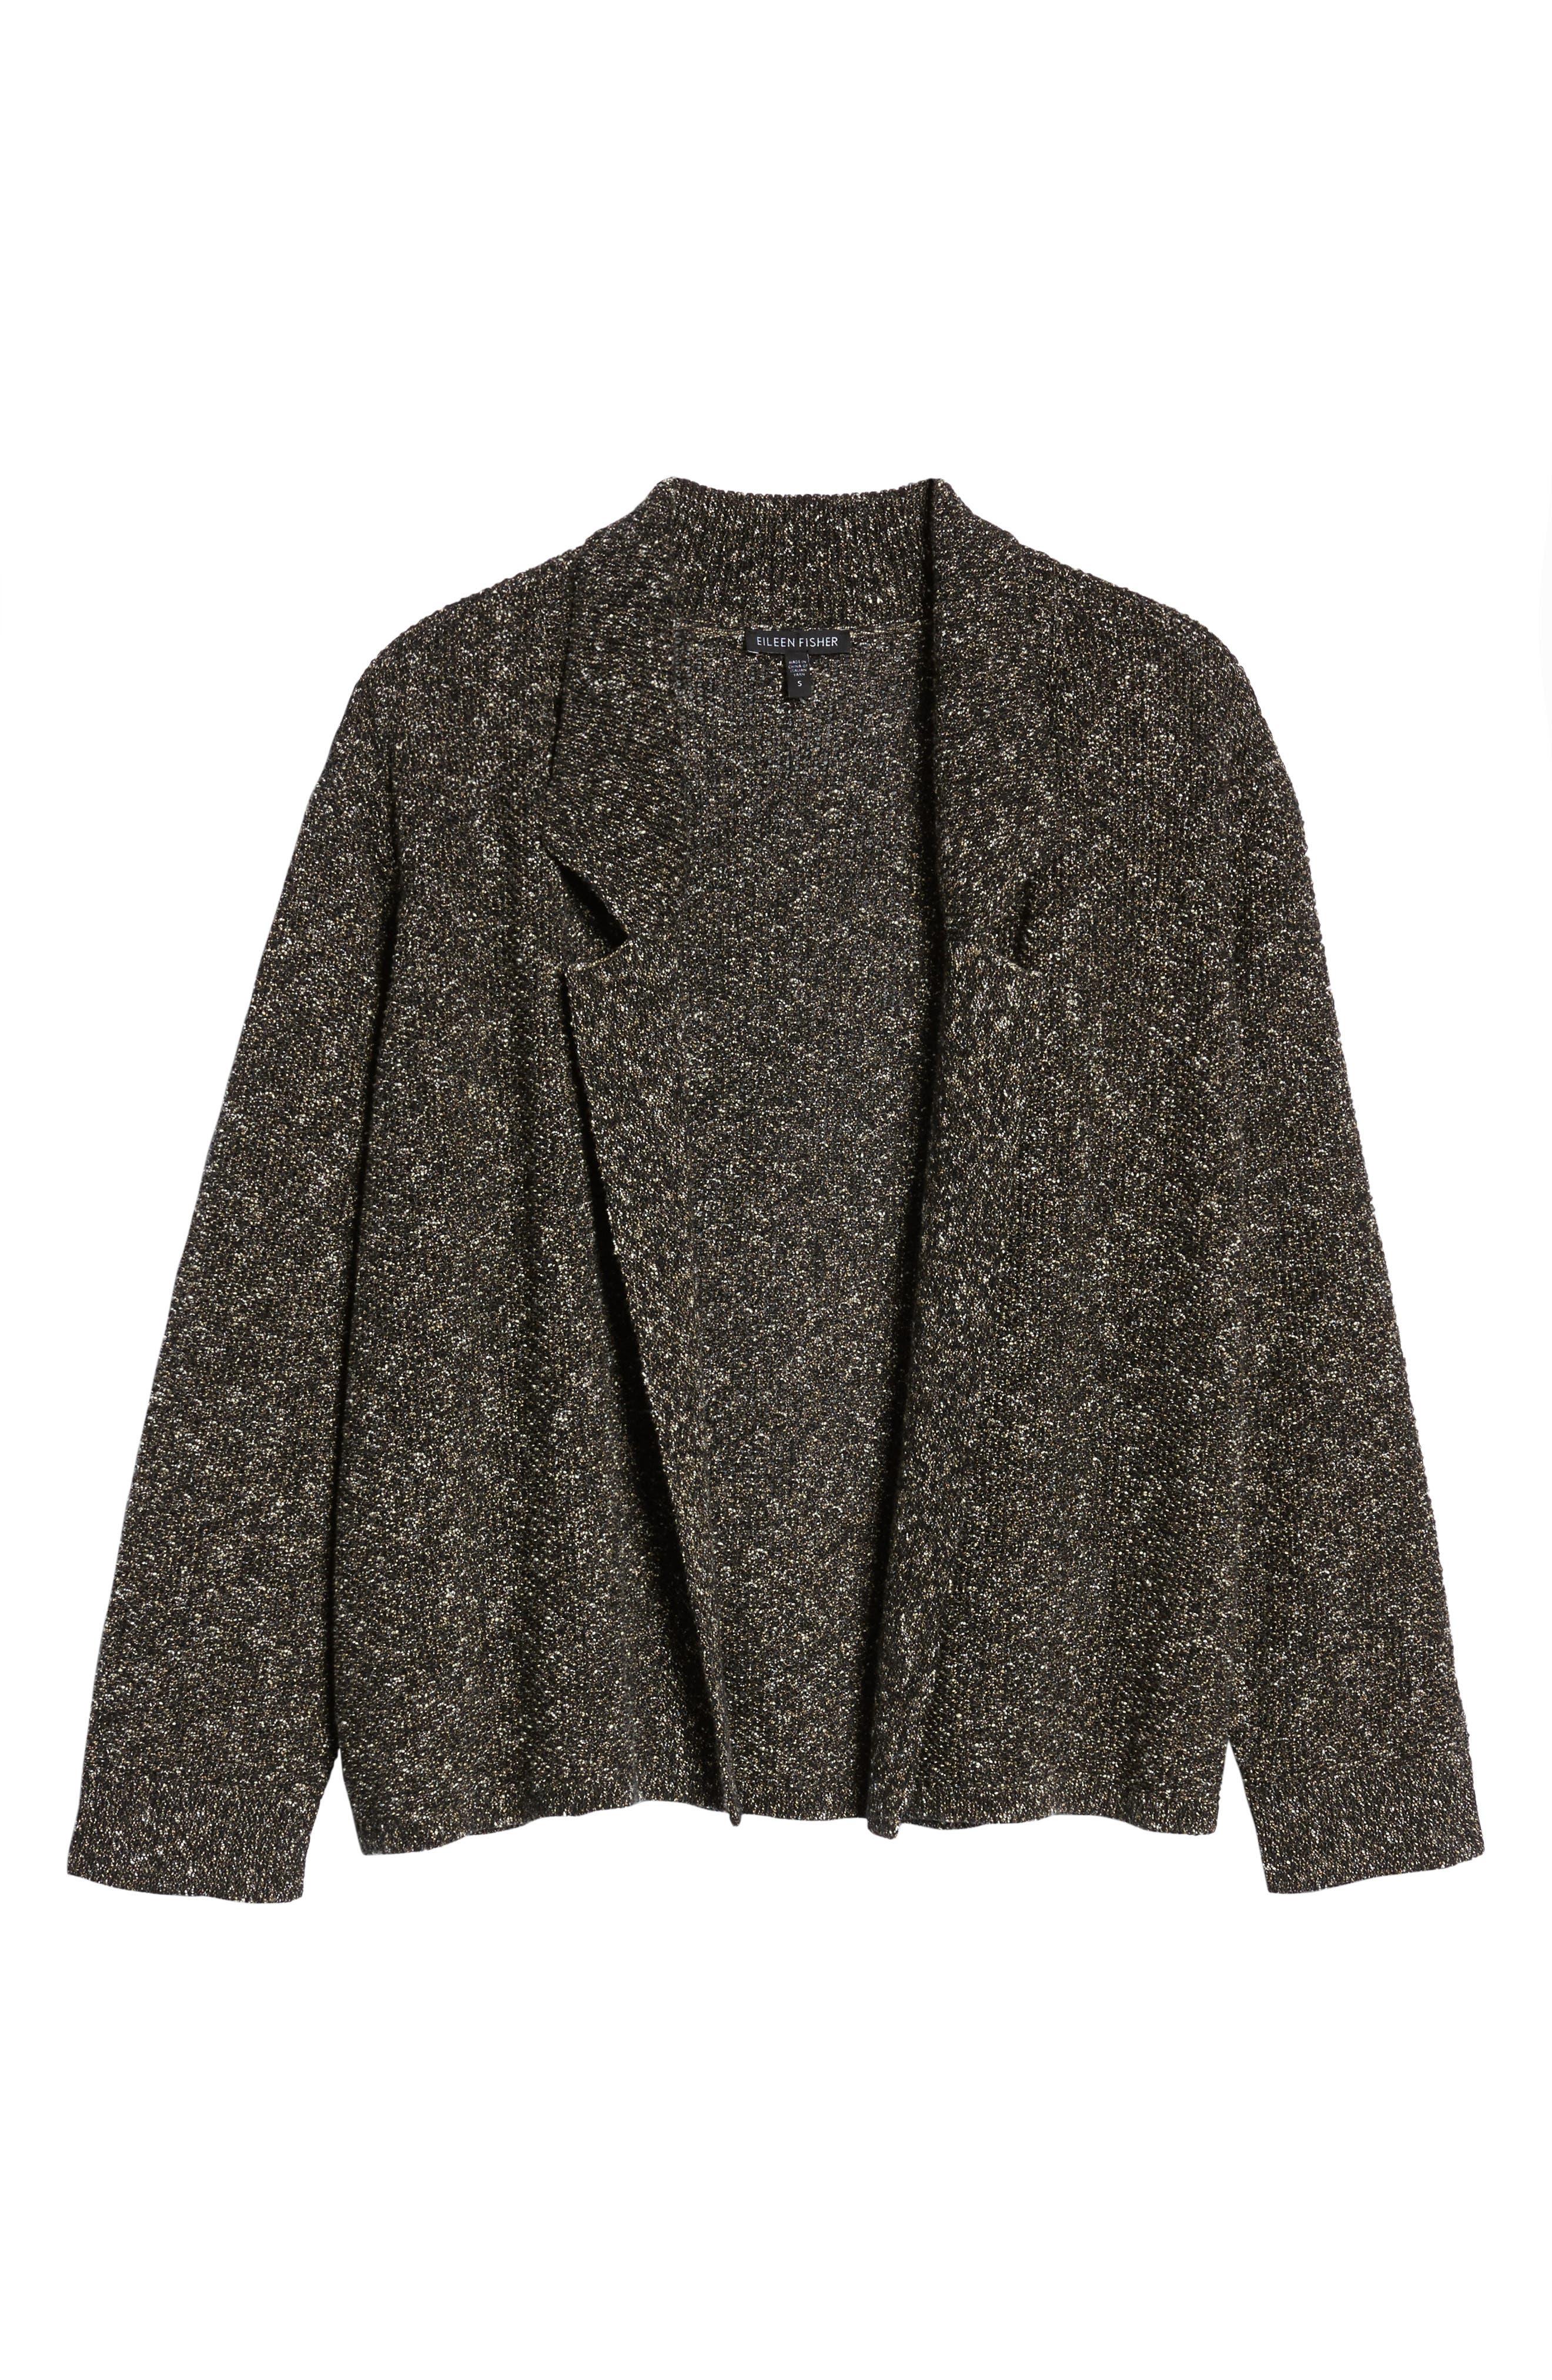 Tweed Sweater Jacket,                             Alternate thumbnail 6, color,                             Black